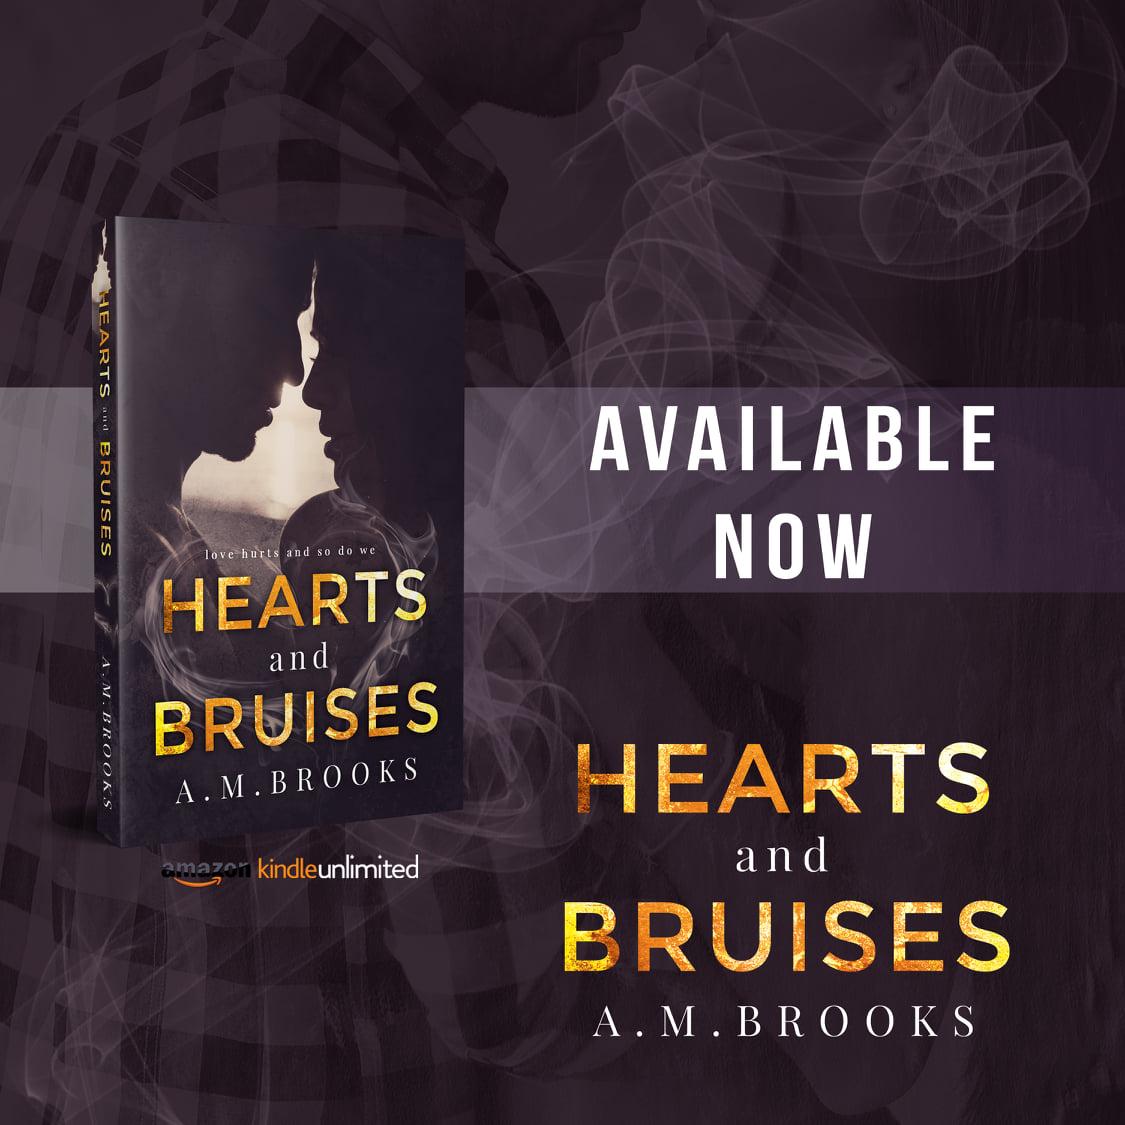 Looking for your next read?  Hearts and Bruises by @brooksauthor #HeartsandBruises #AMBrooks #KINGdom #WelcomeToAraminta #DarkVibes #NewAdultRomance #AMBrooks #Buy  http://books2read.com/heartsandbruises…pic.twitter.com/ARmodys0XY